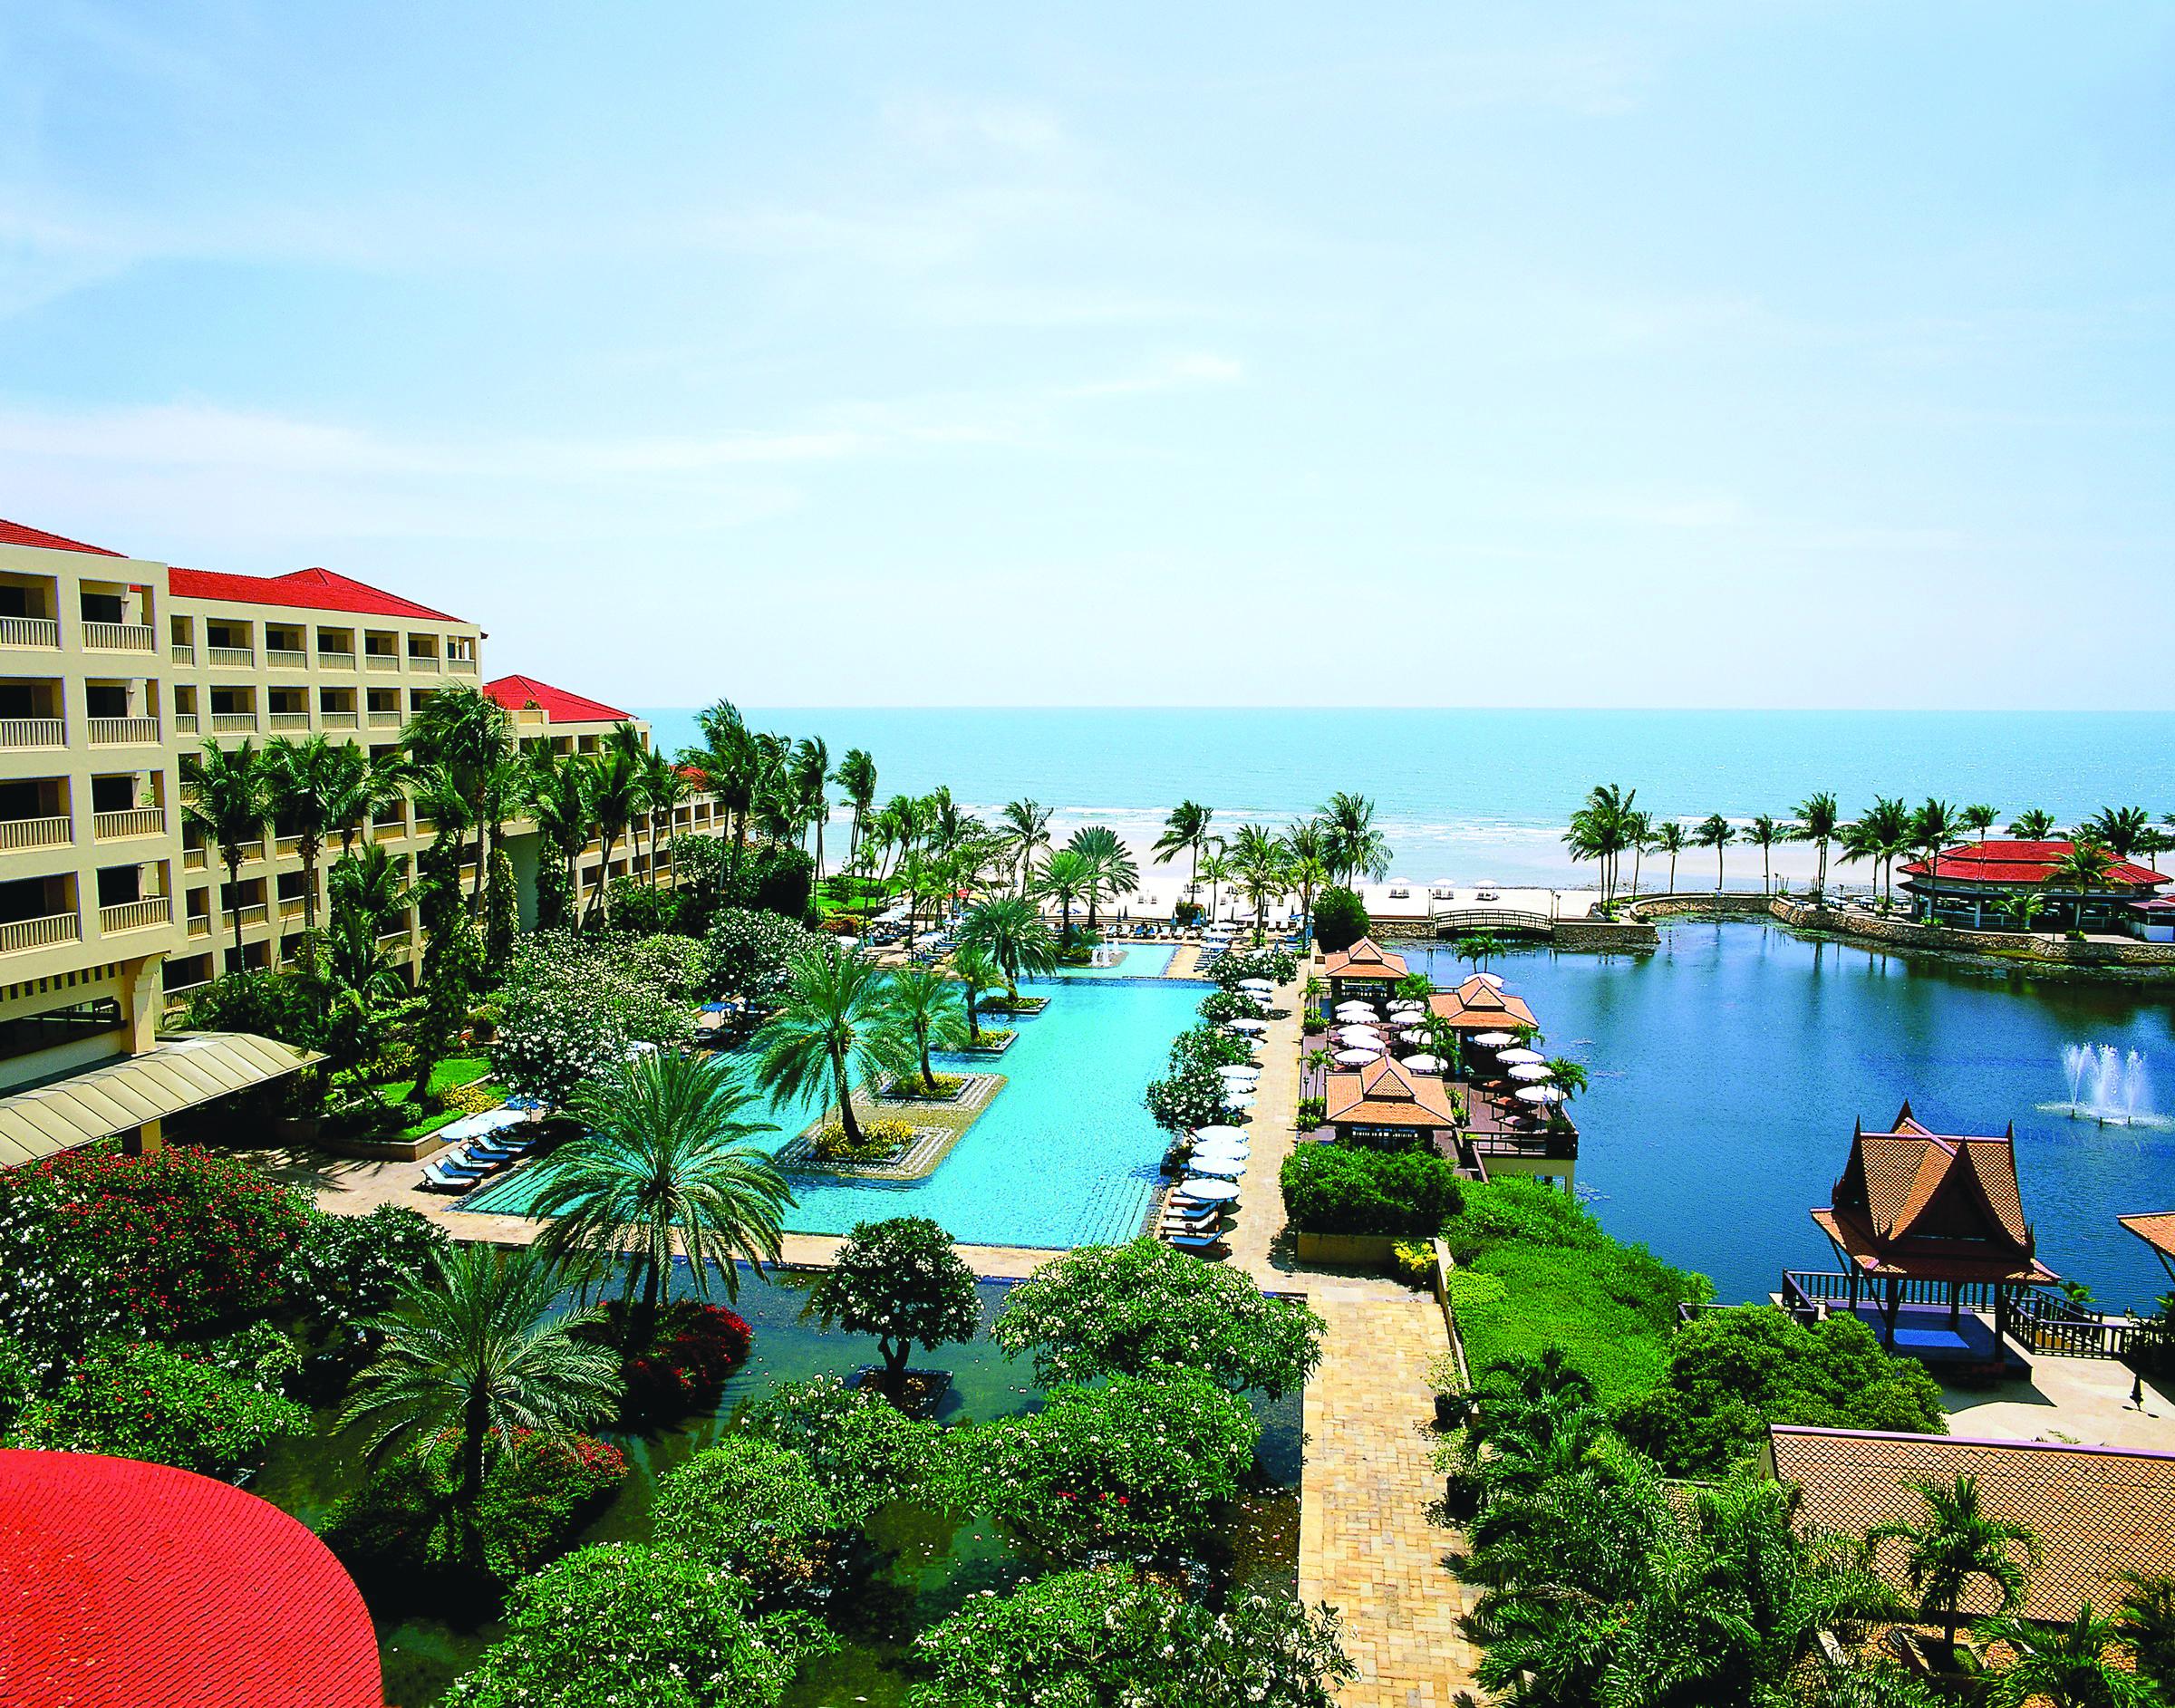 Dusit Thani Hua Hin Over View